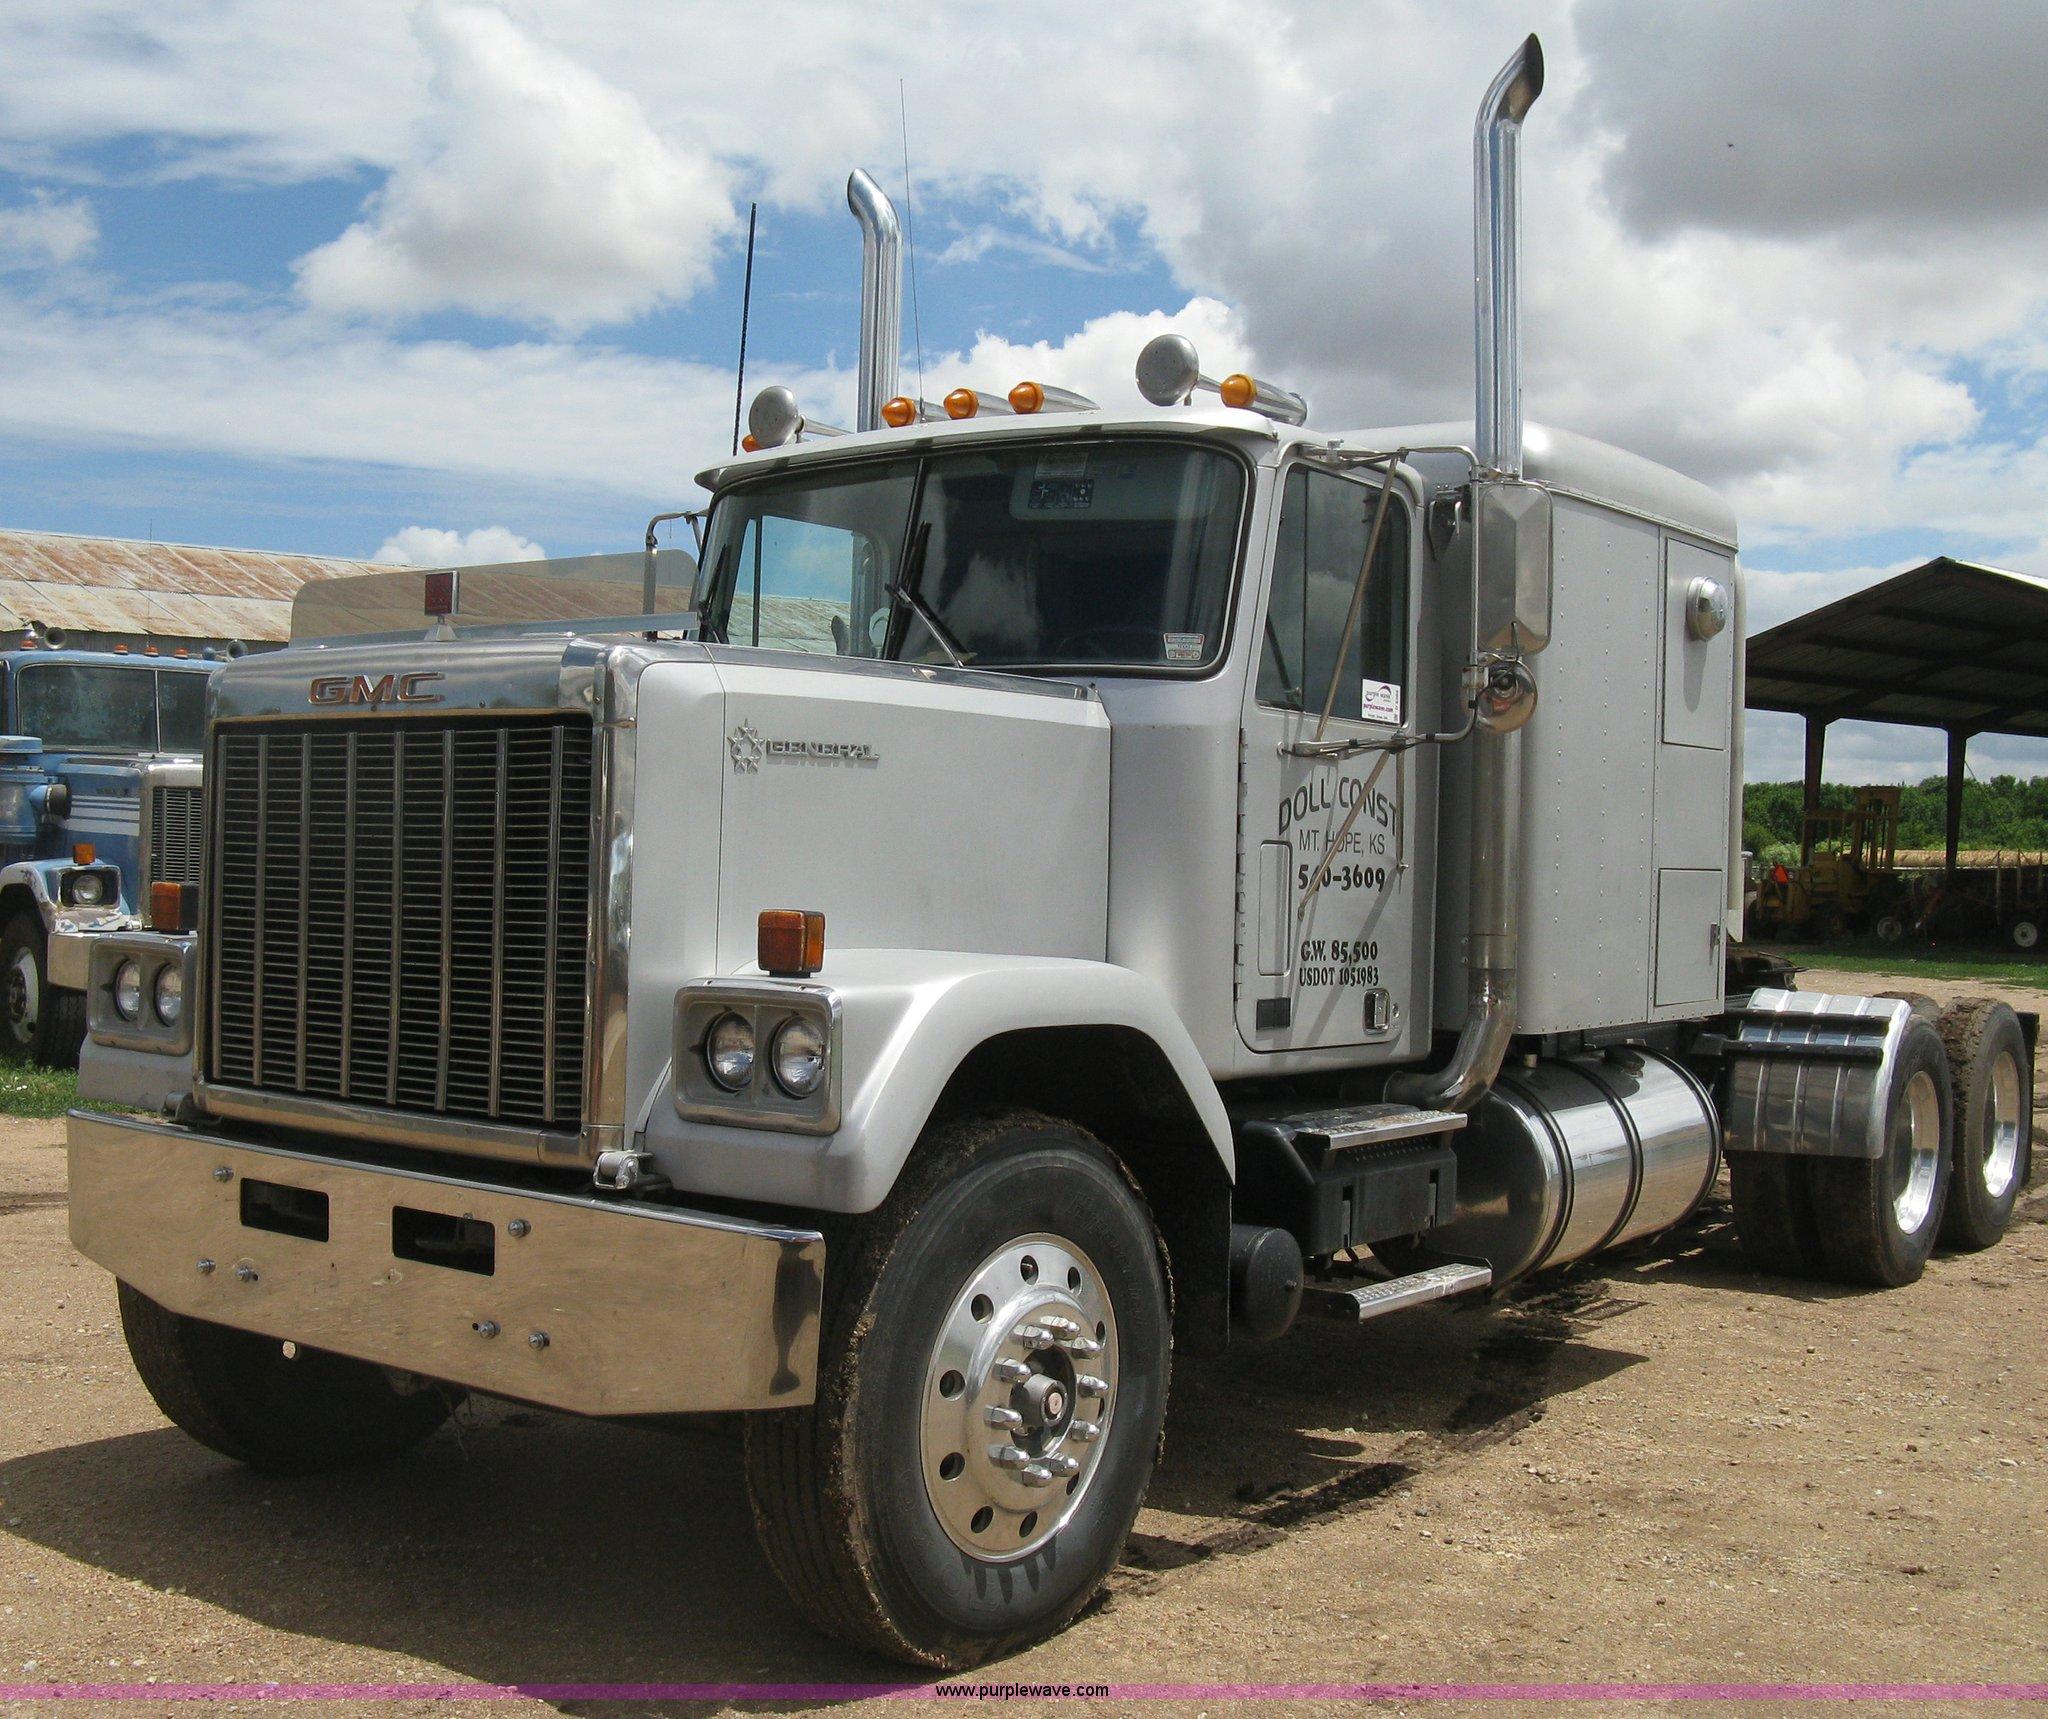 1985 GMC General Semi Truck